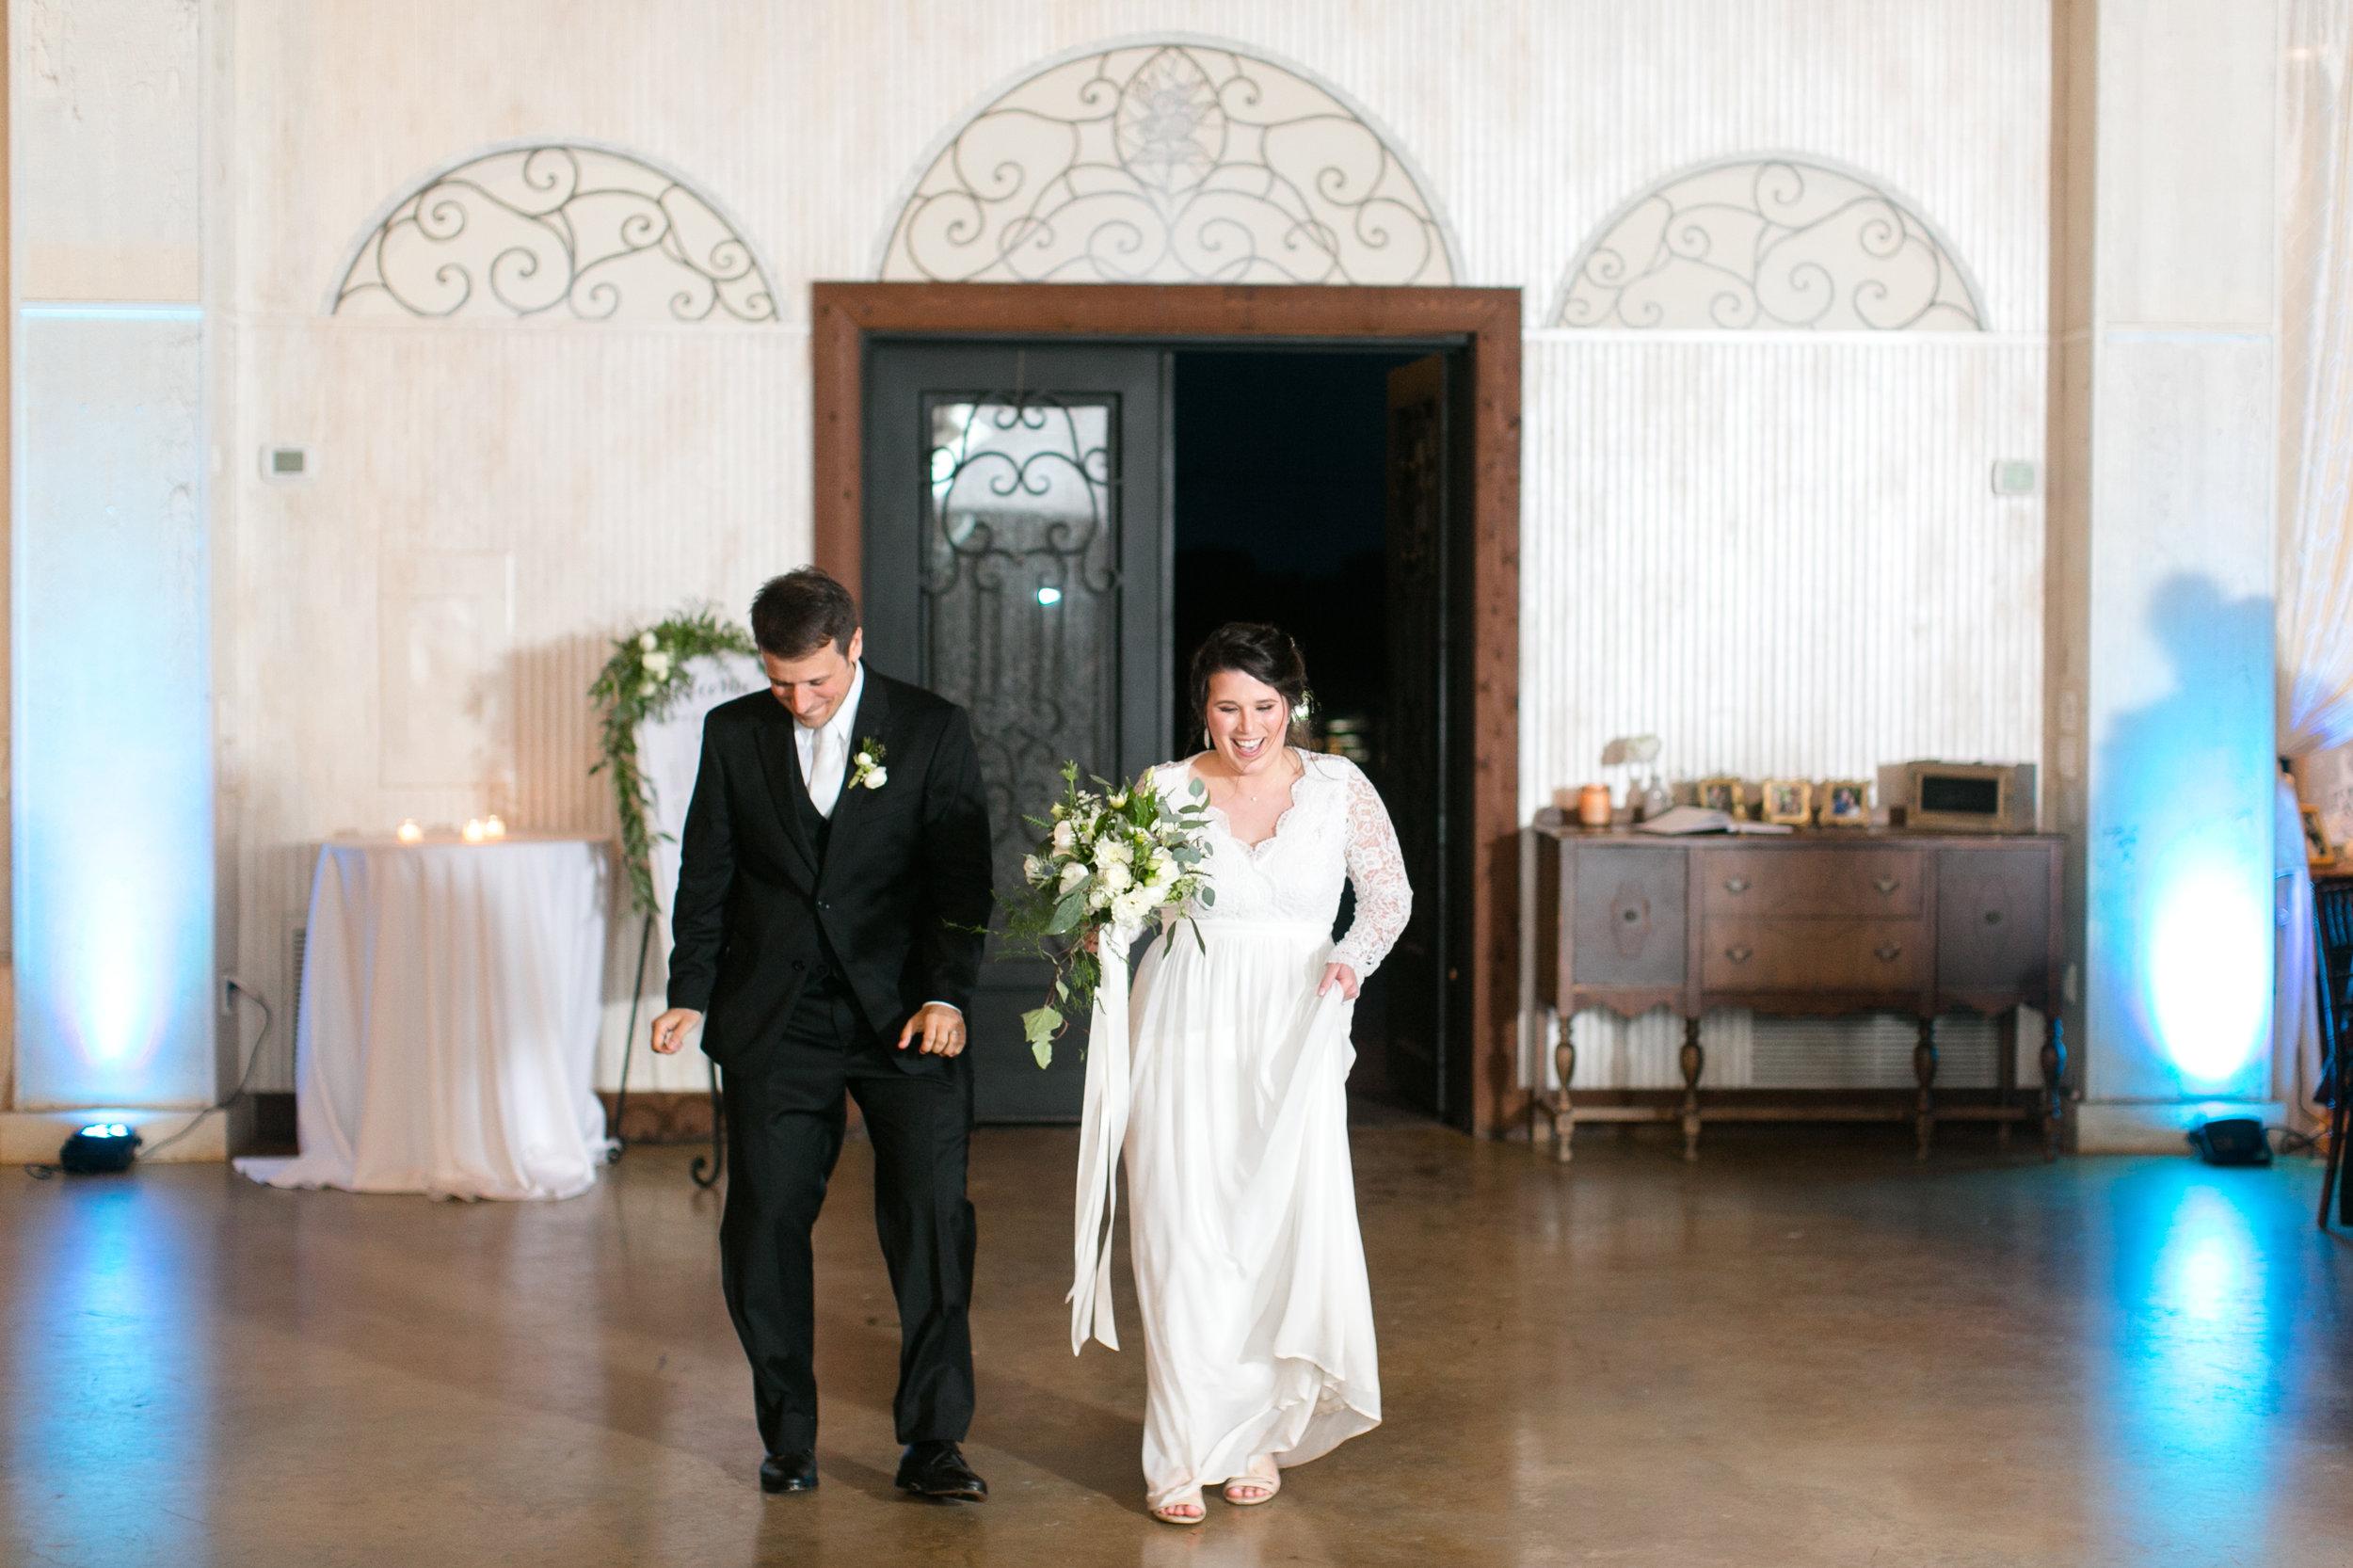 Austin_Texas_Fine_Art_Wedding_Photographer_Kayla_Snell_Photography_Antebellum_Oaks590.jpg